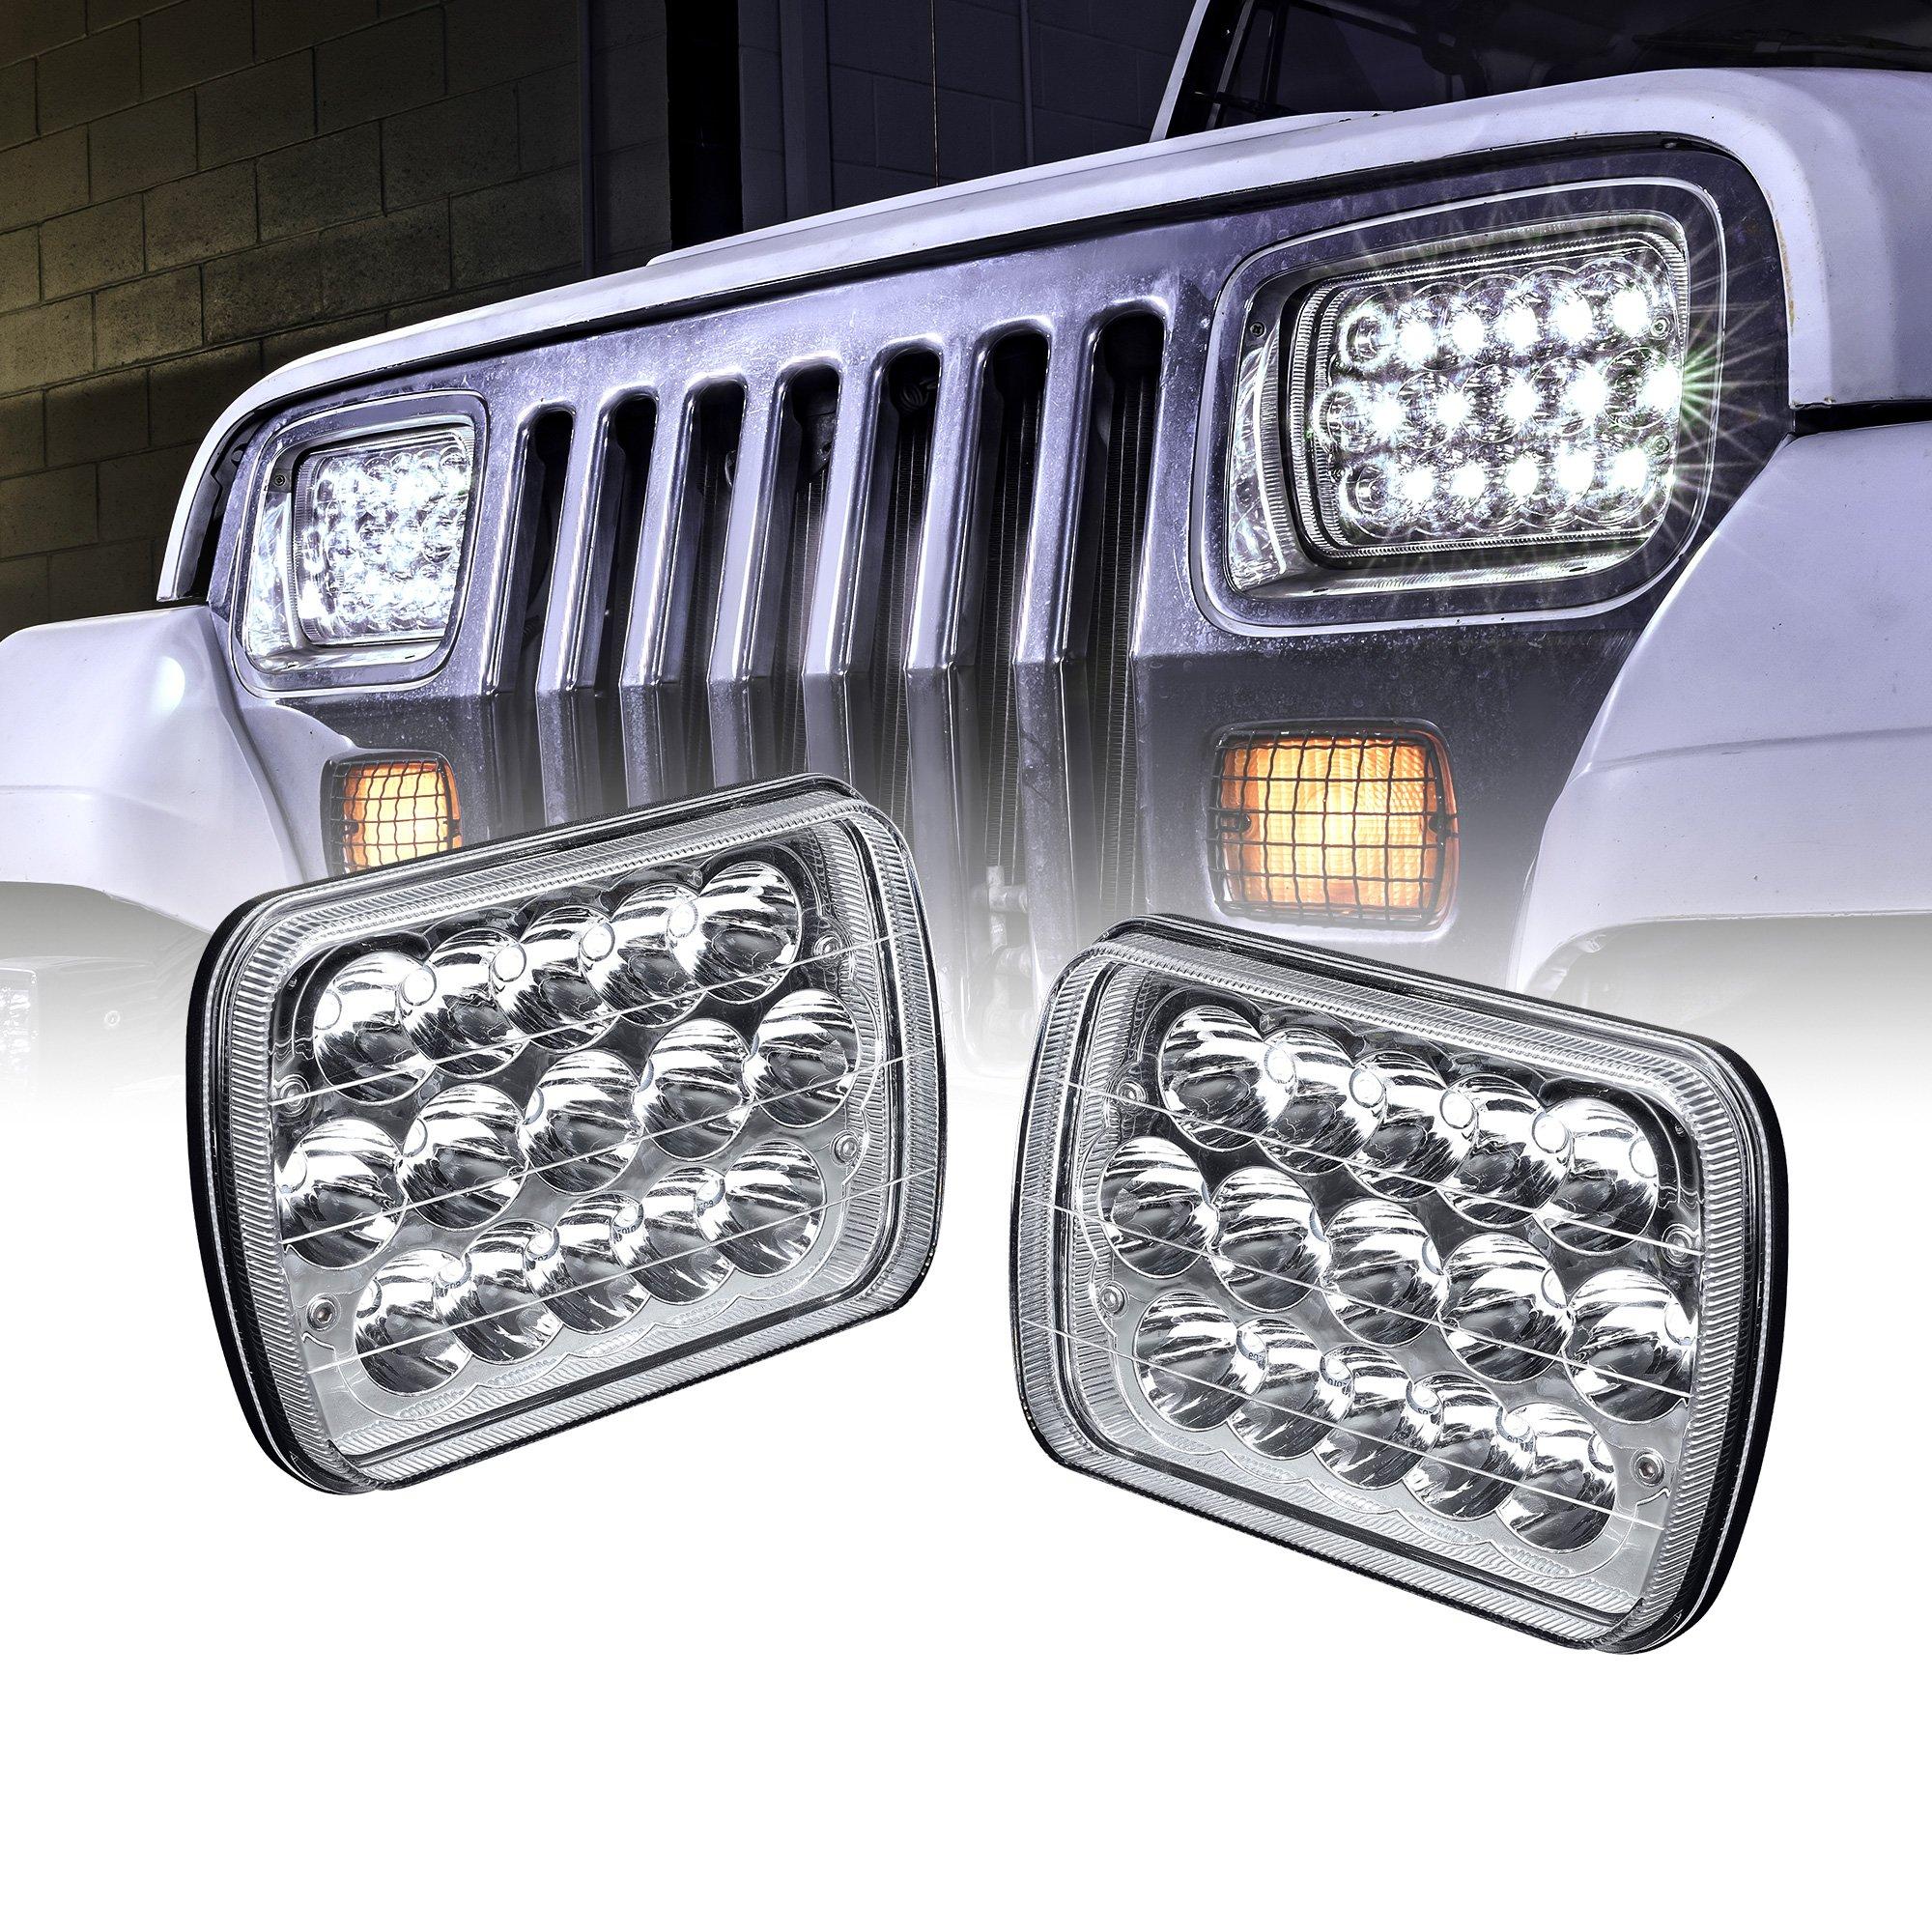 ONLINE LED STORE Universal 5x7 7x6 inch 45W LED Headlight Set [Plug & Play] [Energy Efficient] [Rugged] - Sealed Beam Square/Rectangular Headlight Pair (High/Low Beam: 100%/60% LED Usage)